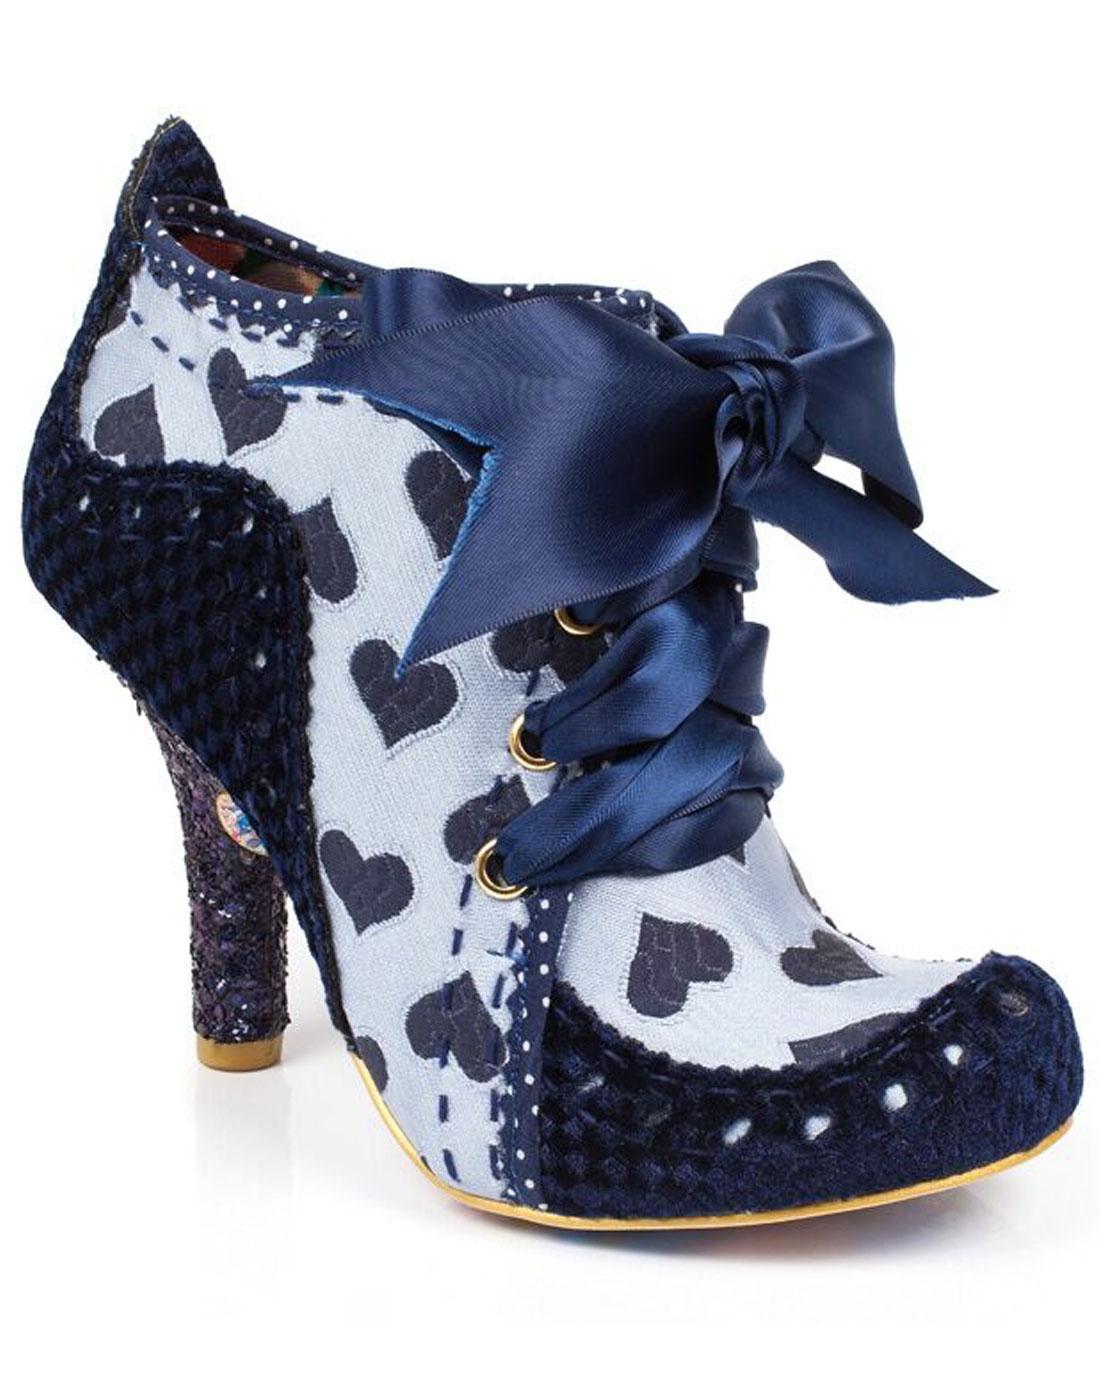 Abigails Third Party IRREGULAR CHOICE Heel Boots B